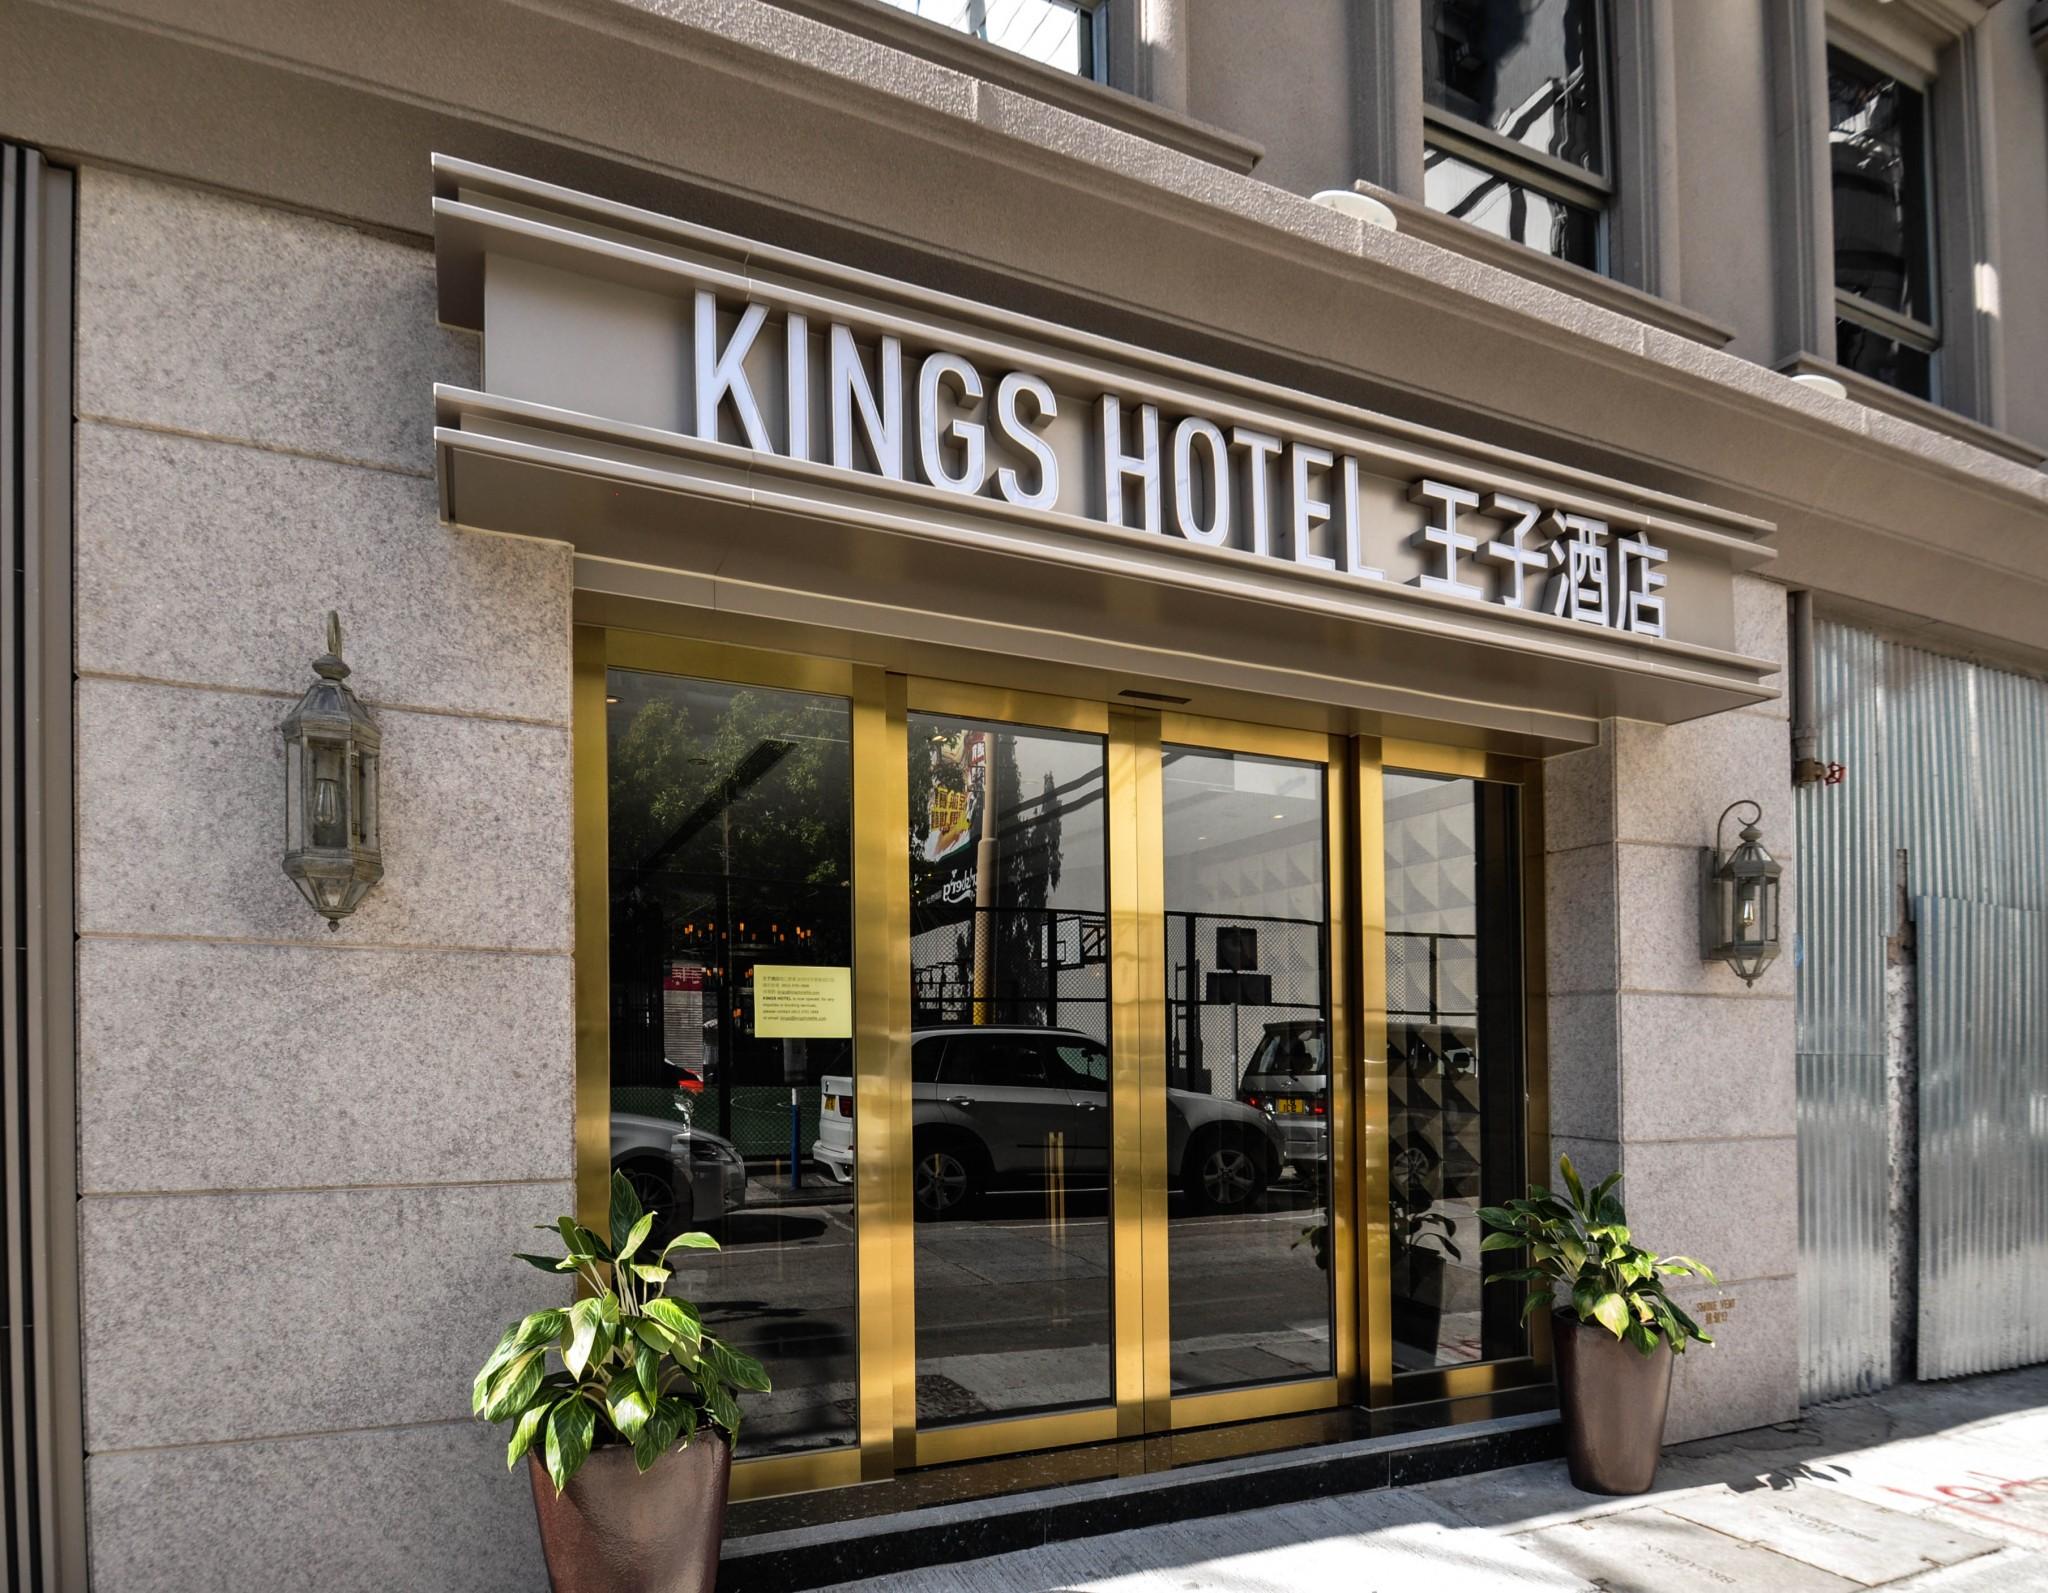 Hotel 王子酒店  香港酒店 預訂房間 即時預訂 優惠價格